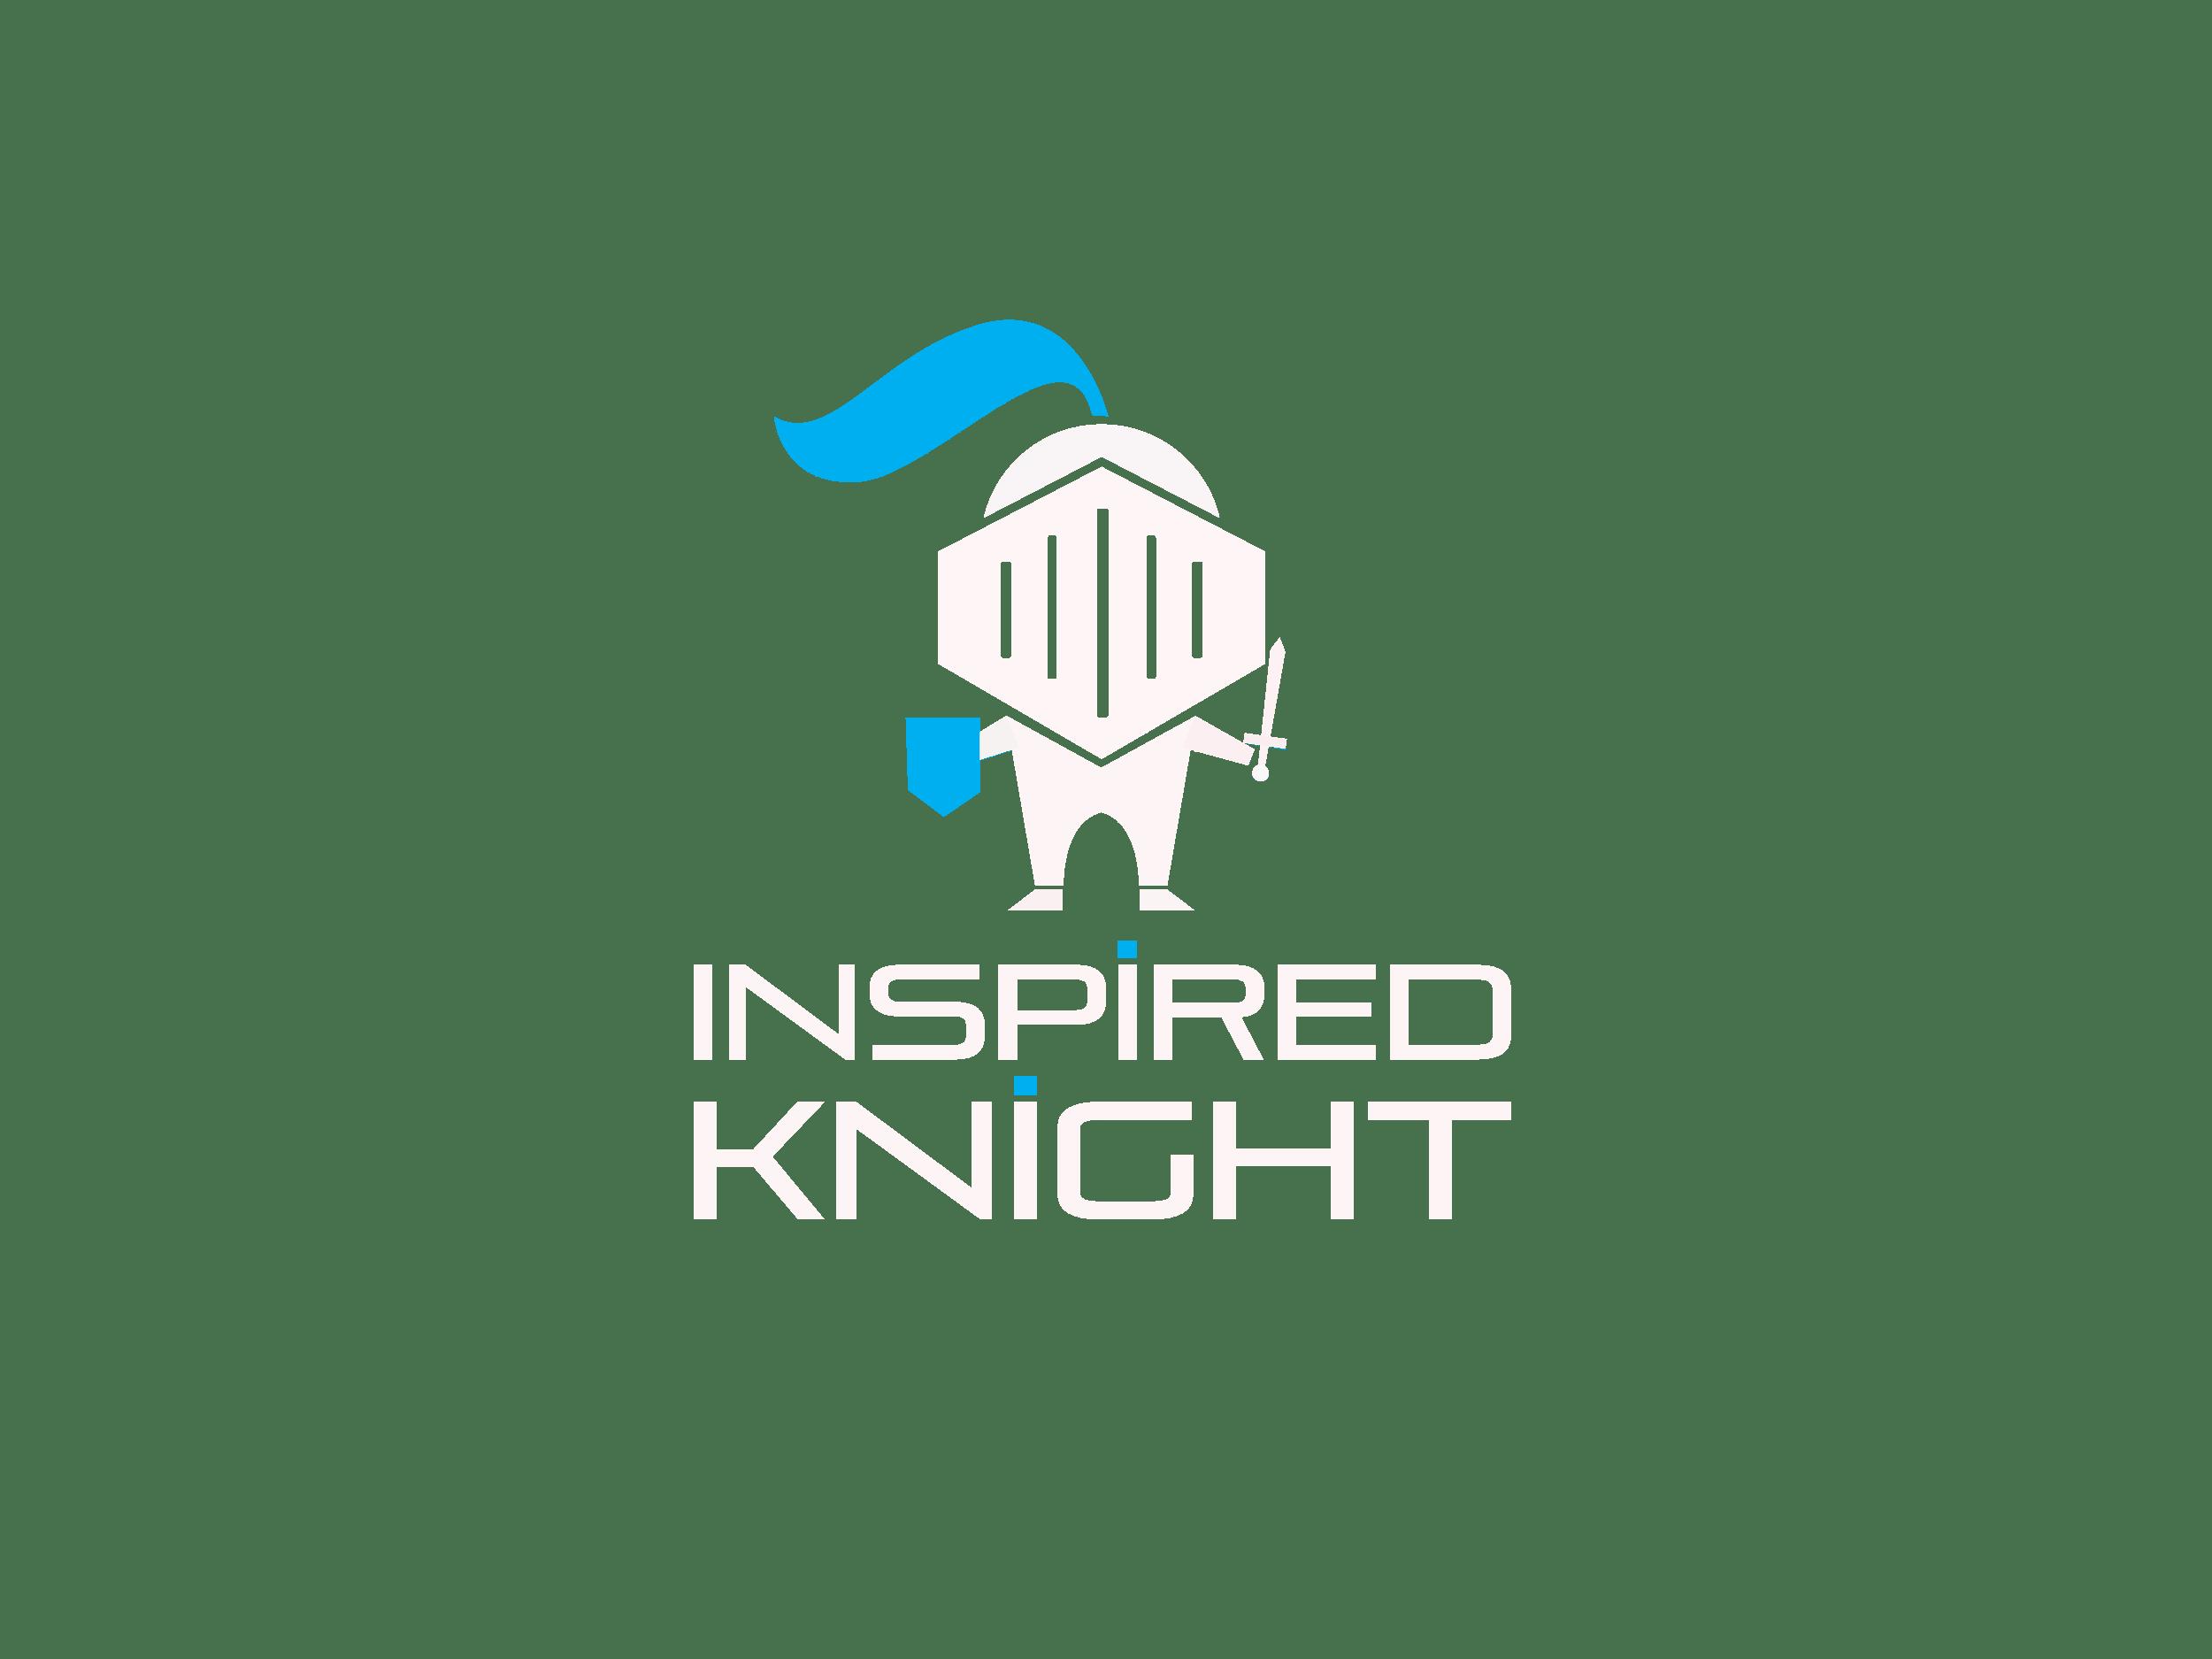 Inspired Knight